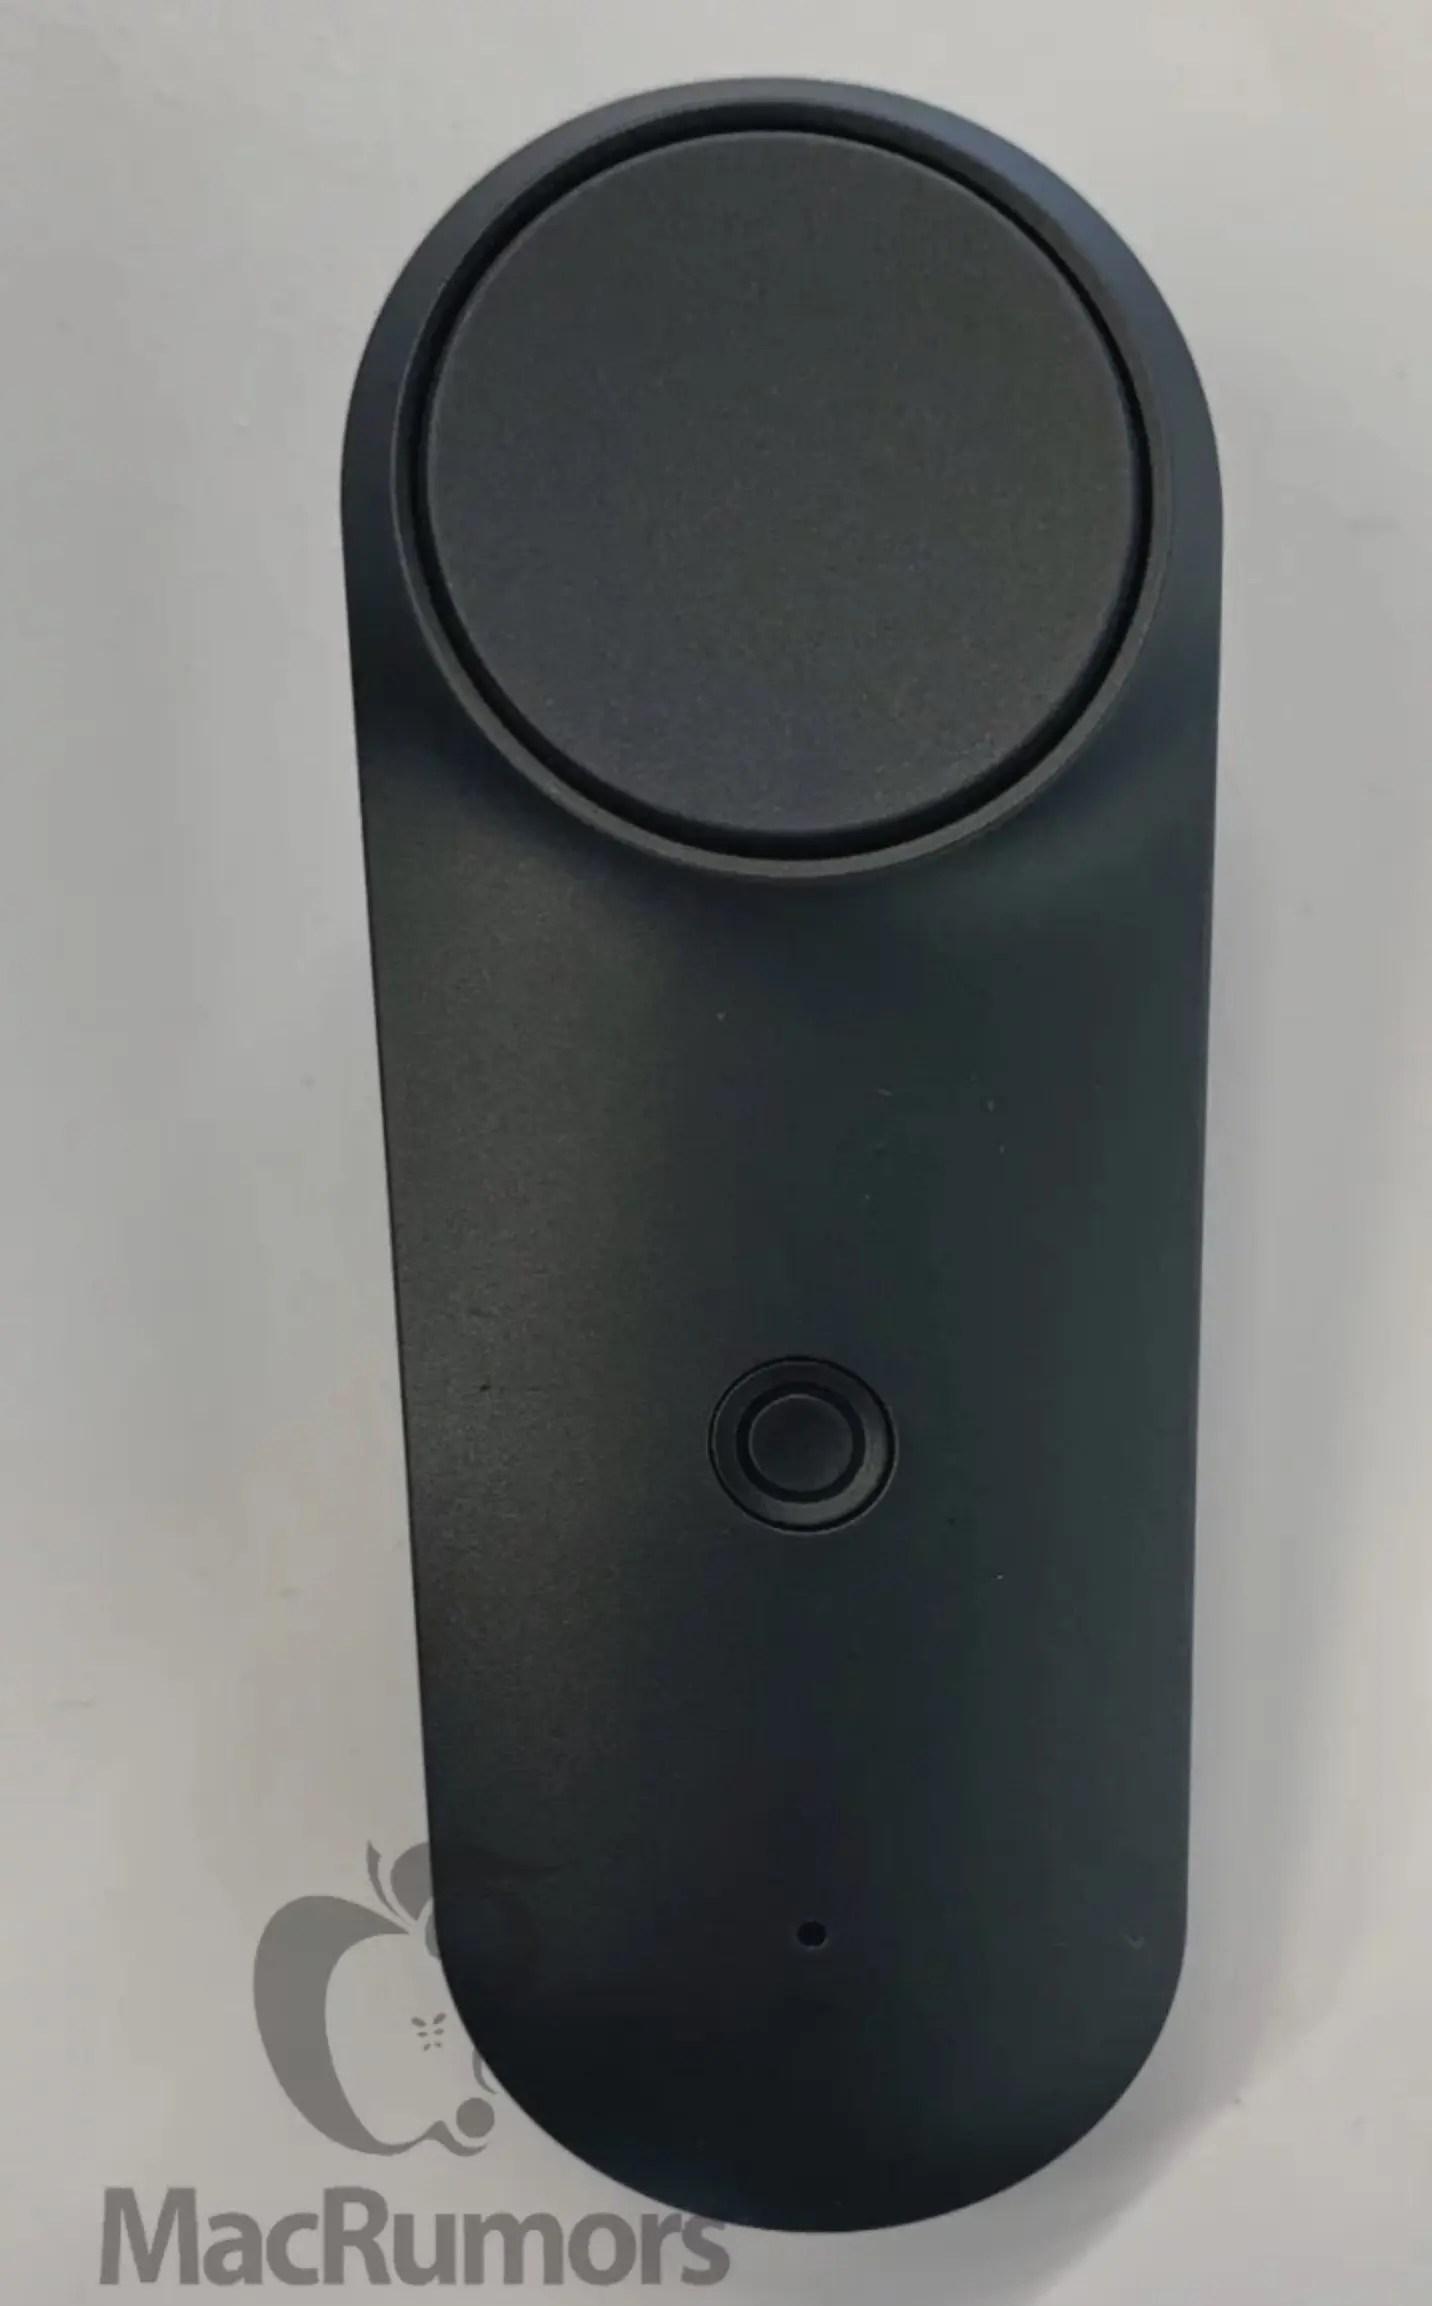 Prototyp eine Apple AR-Controllers